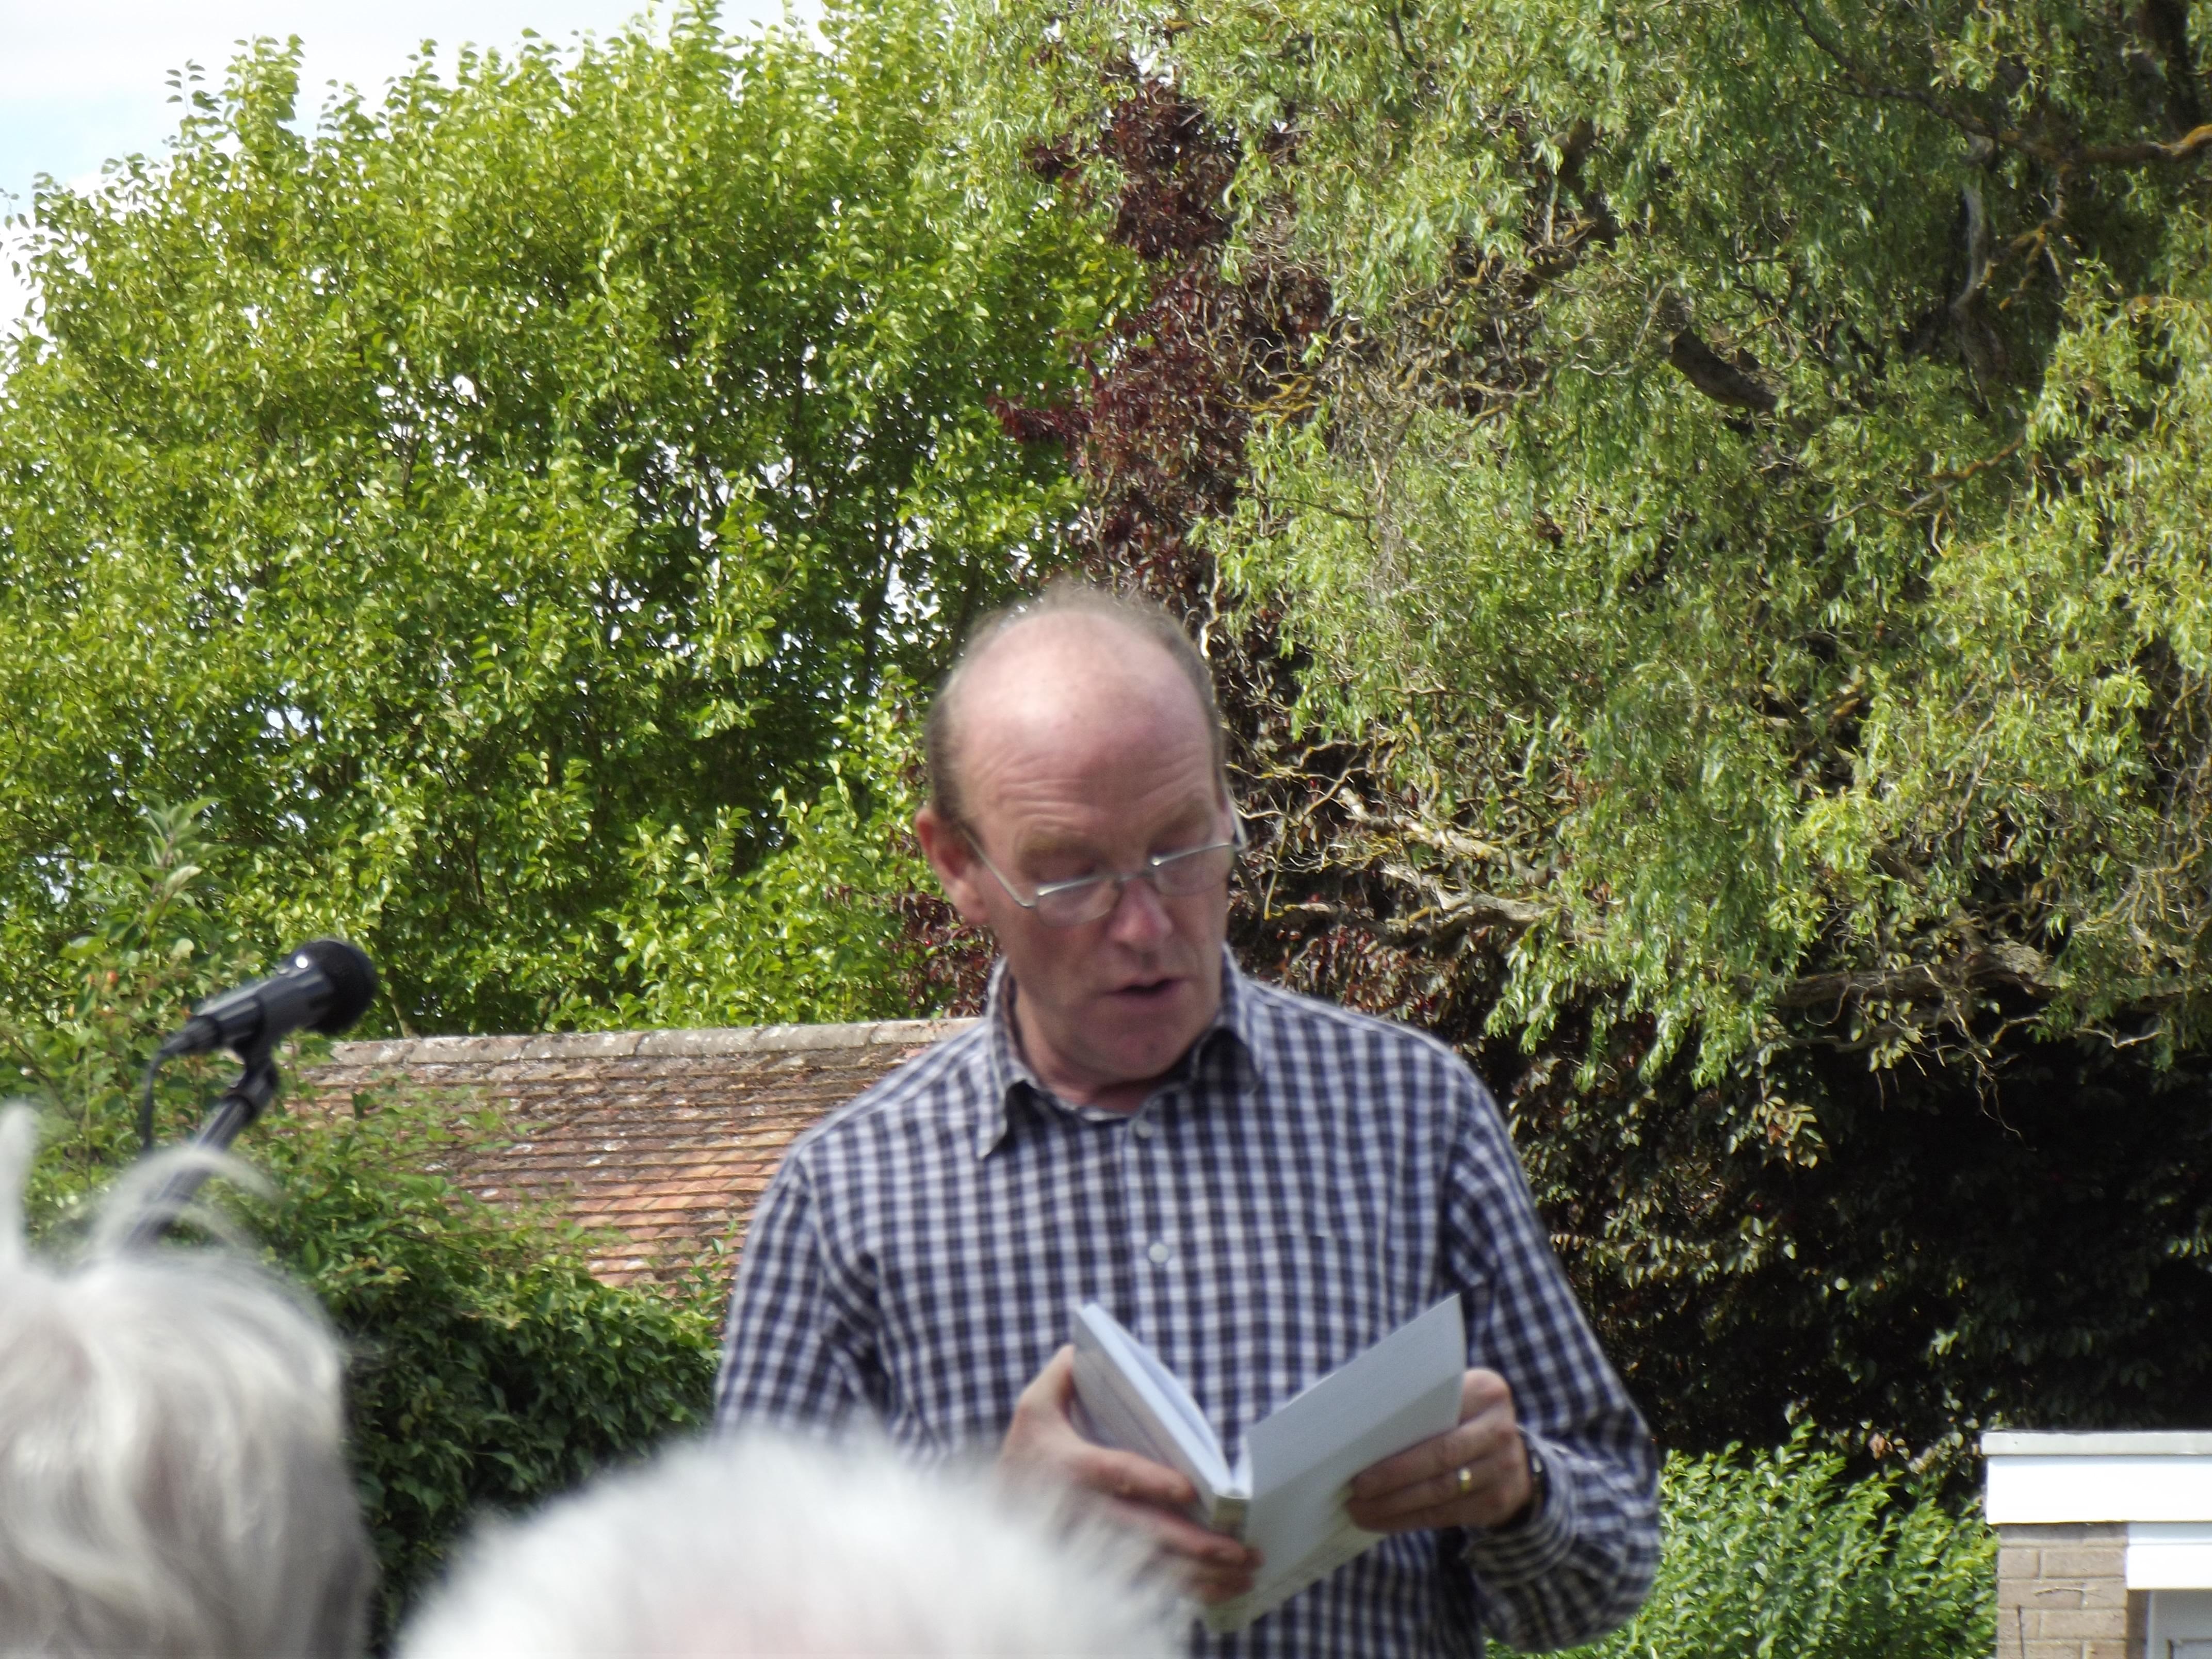 George introduces a hymn